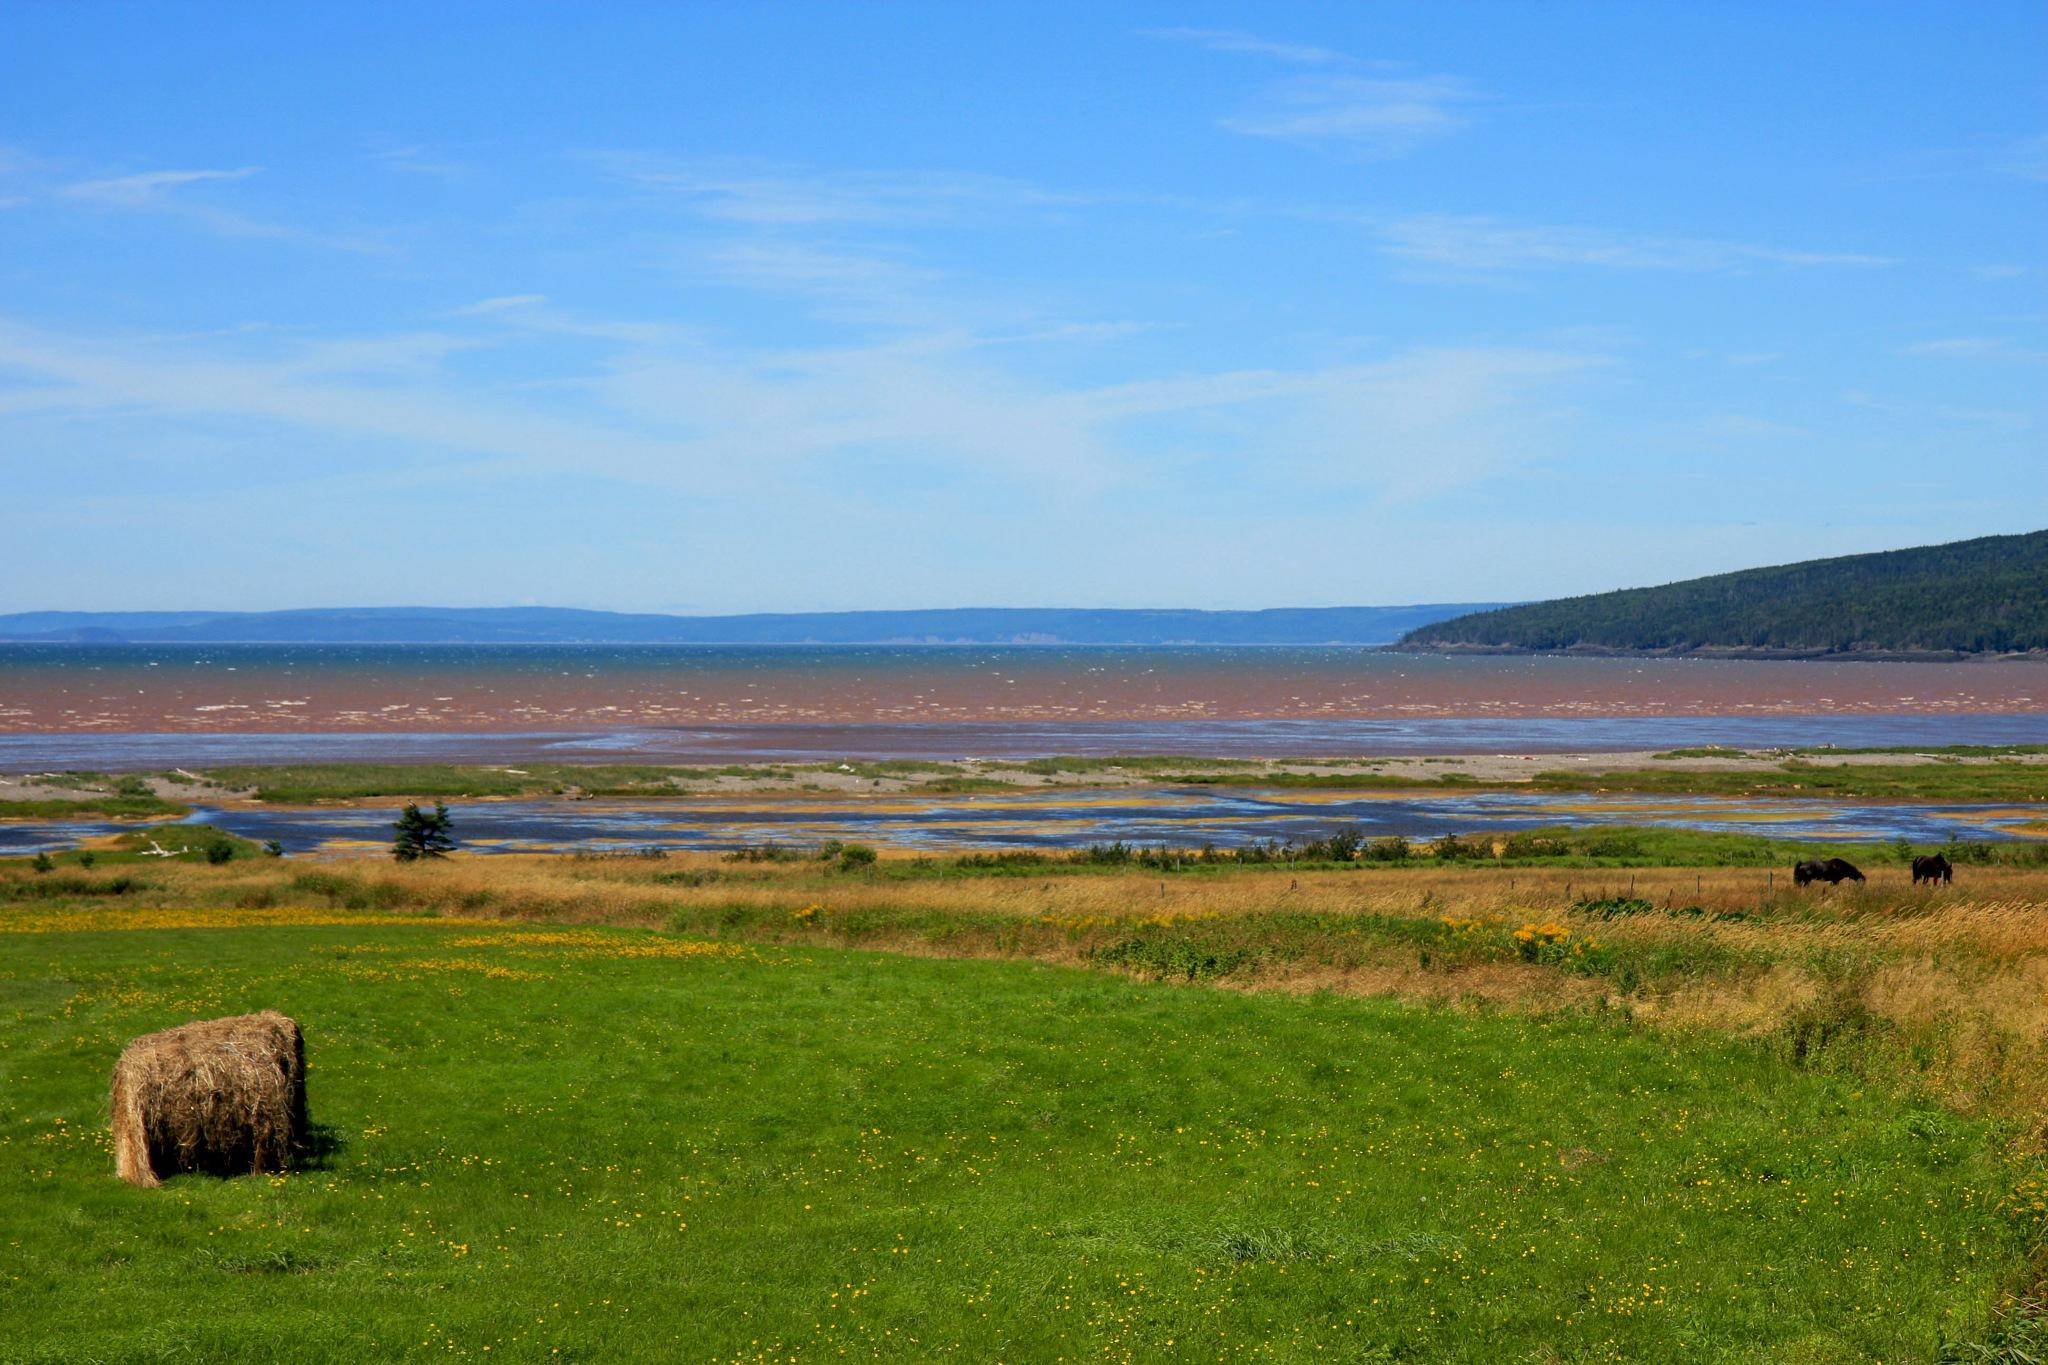 Nova Scotia Rural Shoreline Along the Bay of Fundy by Wendy Farrington